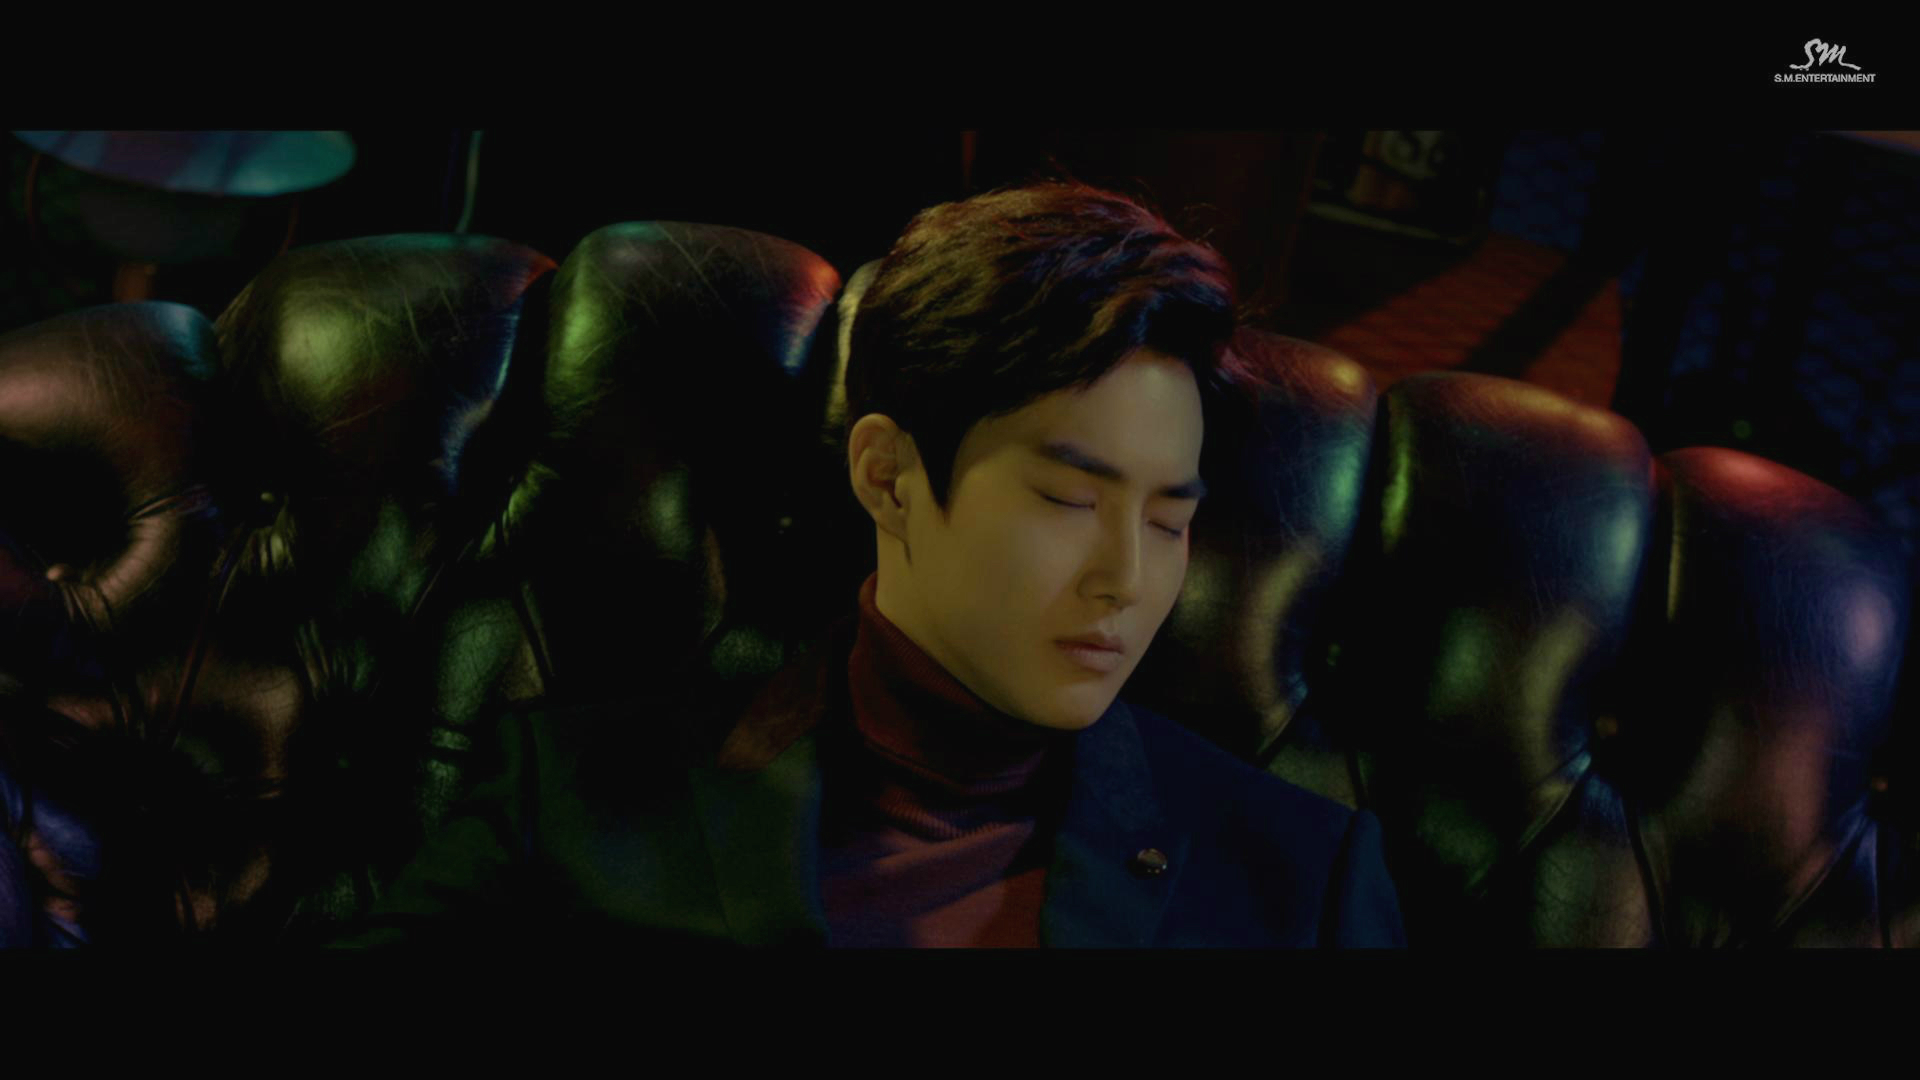 [STATION] 수호X송영주_커튼(Curtain)_Teaser Clip #1